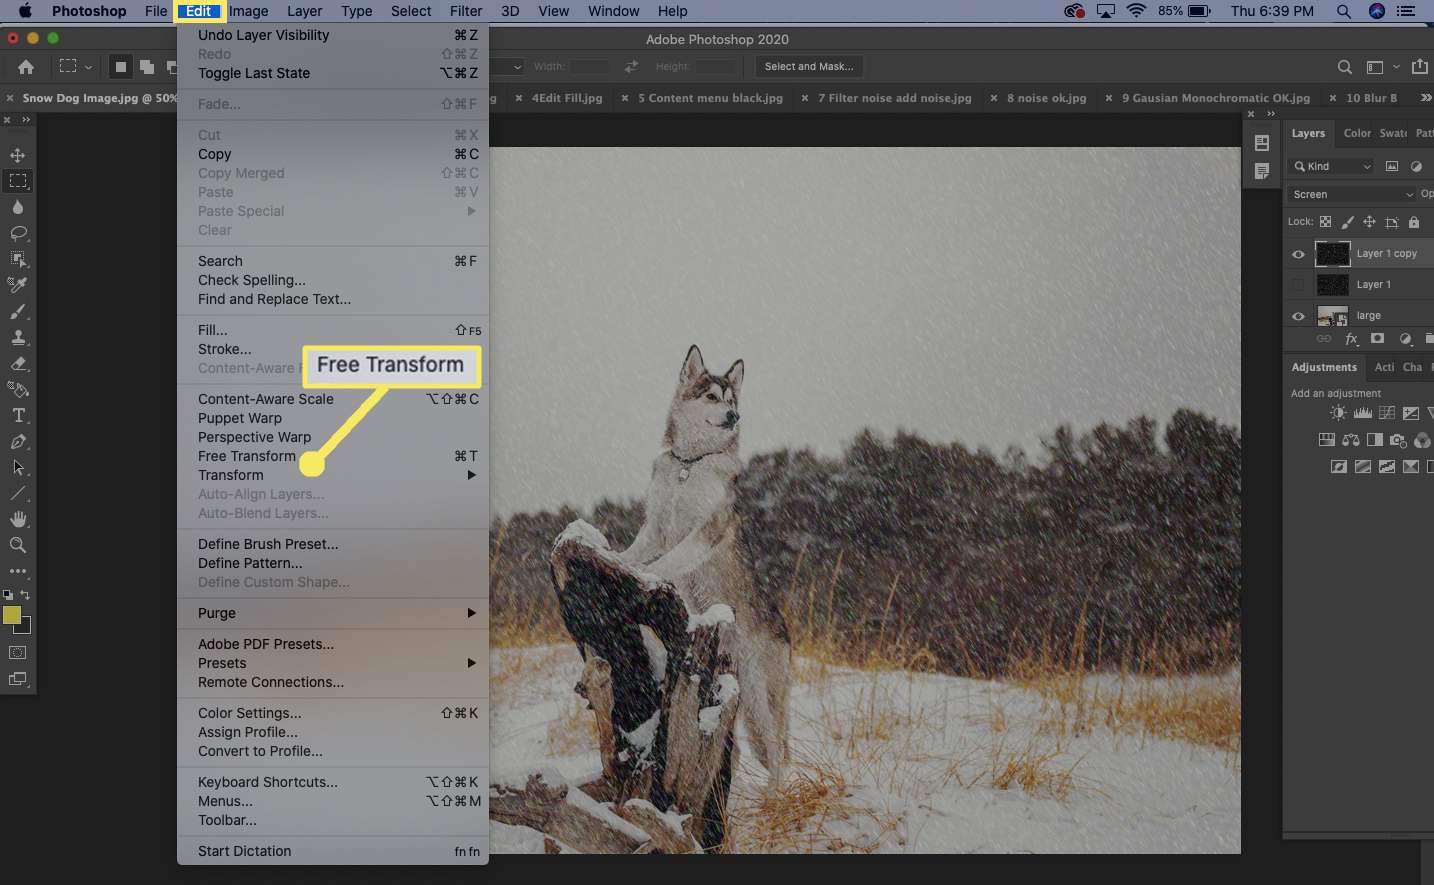 Select Edit > Free Transform.